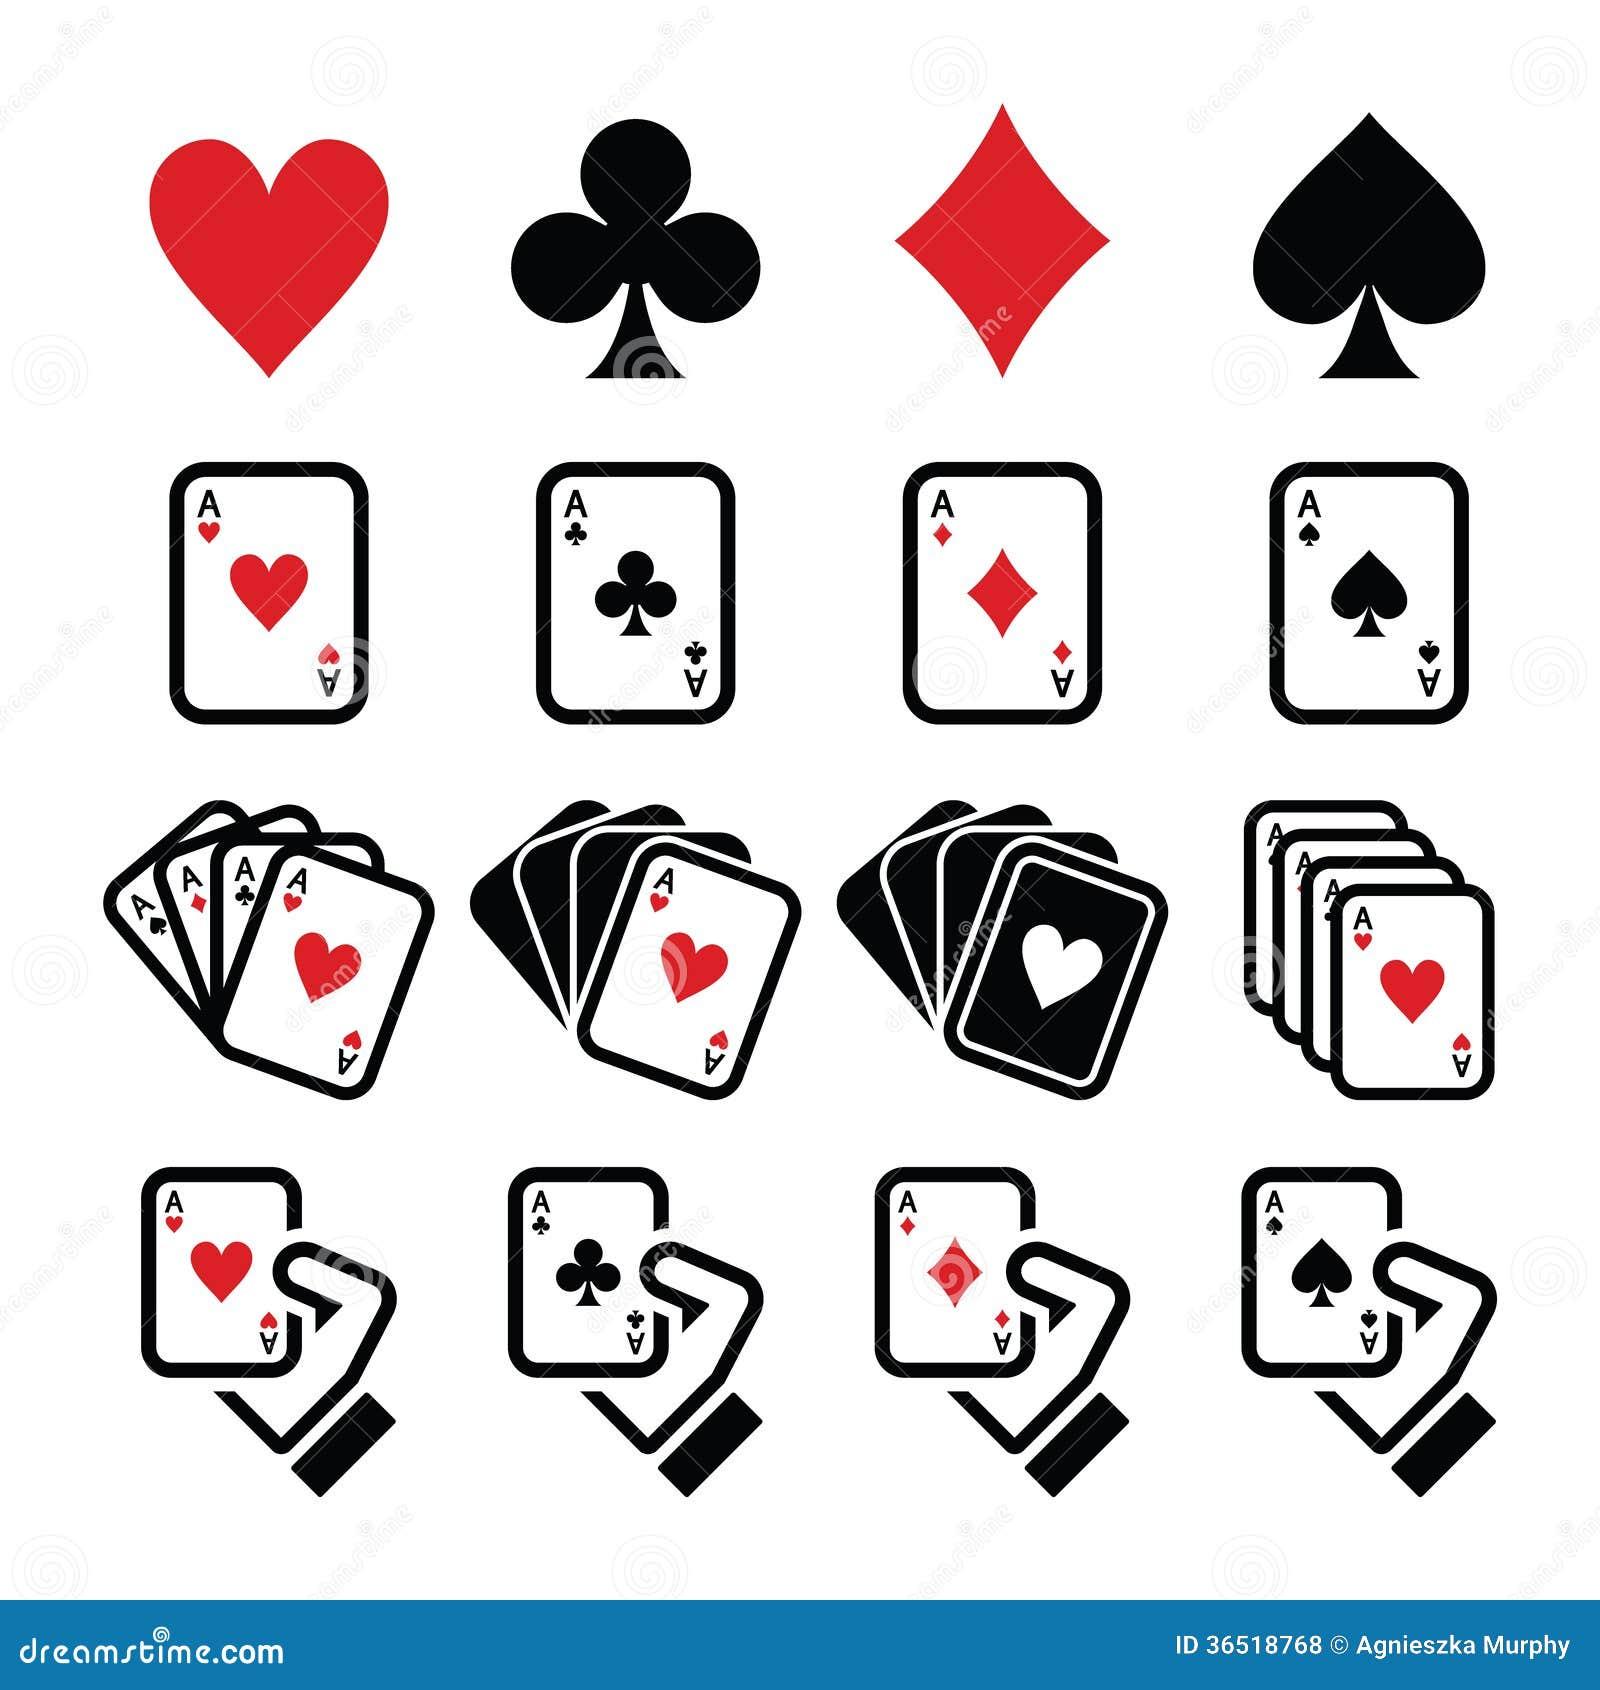 how to win online casino king of hearts spielen